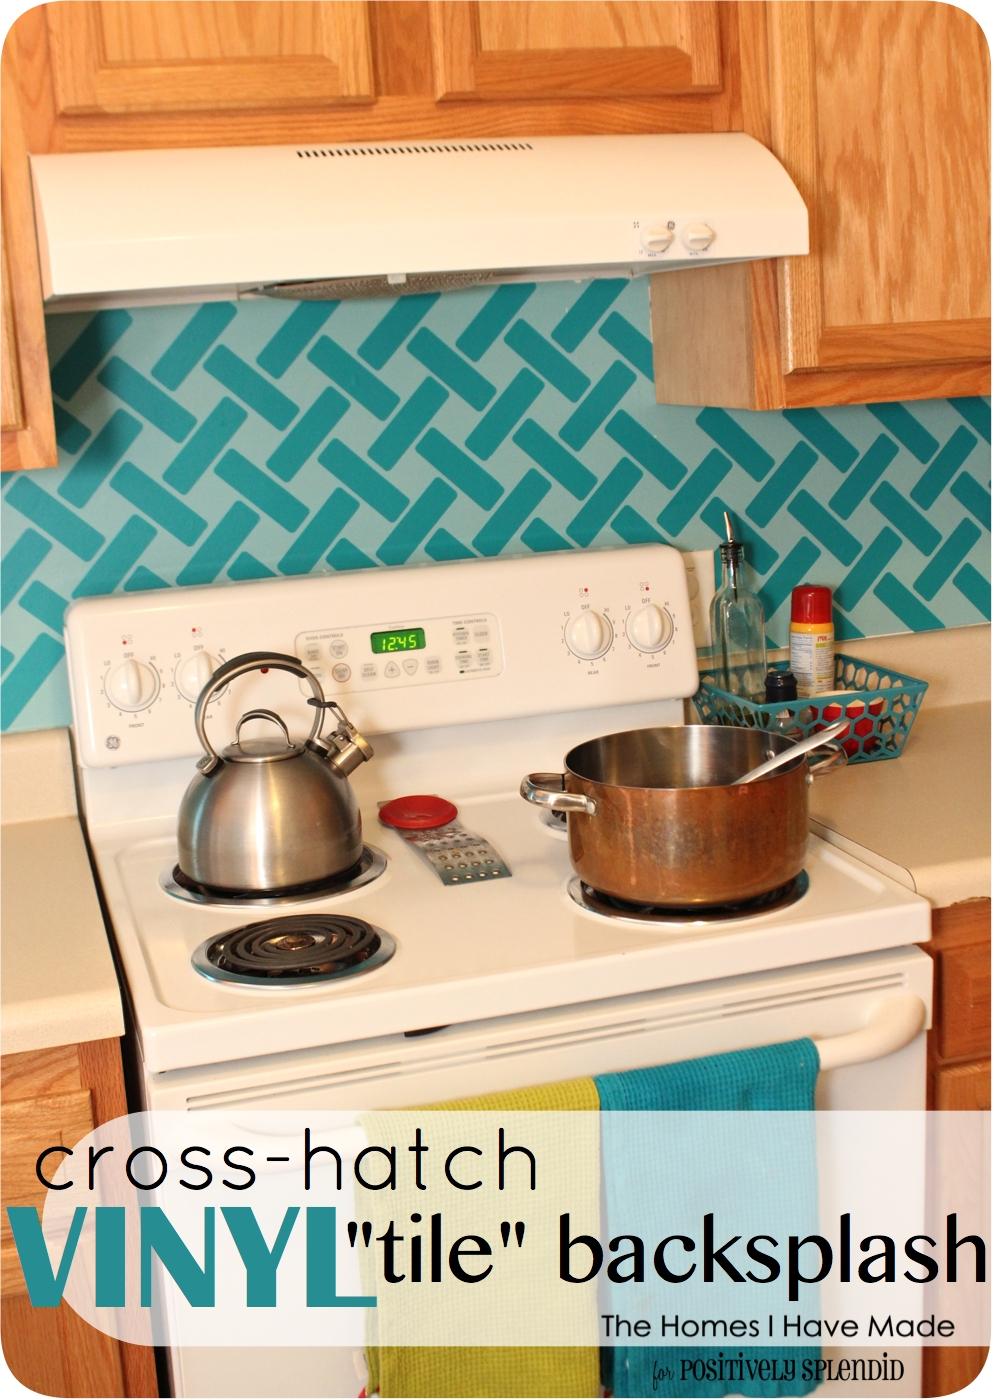 Cross Hatch Vinyl Tile Backsplash   Positively Splendid Crafts 1000x1400